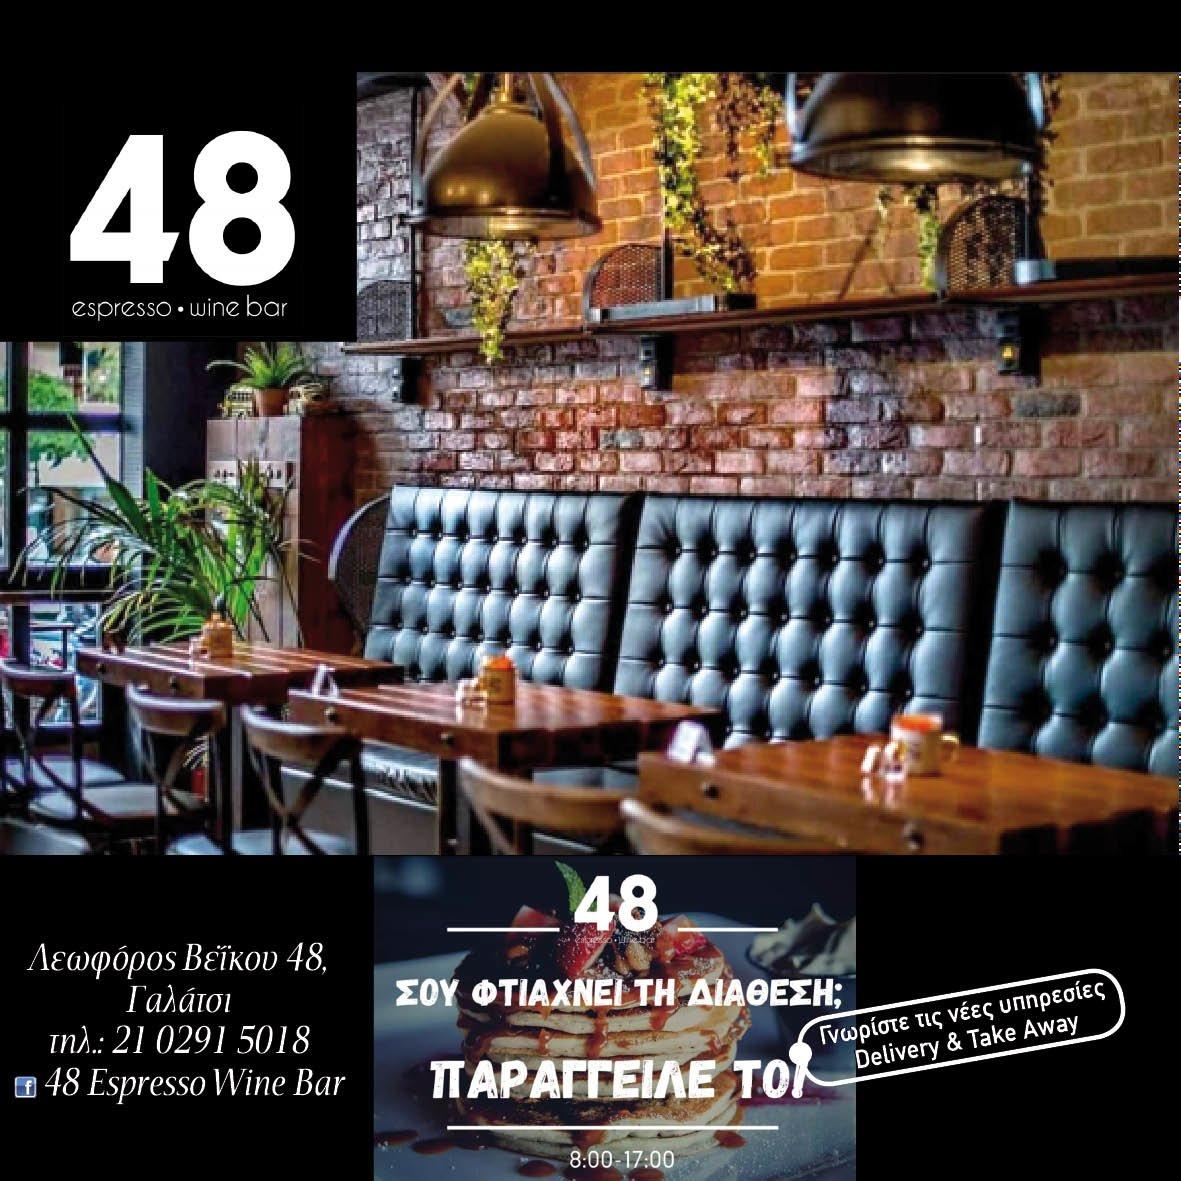 48 espresso – wine bar